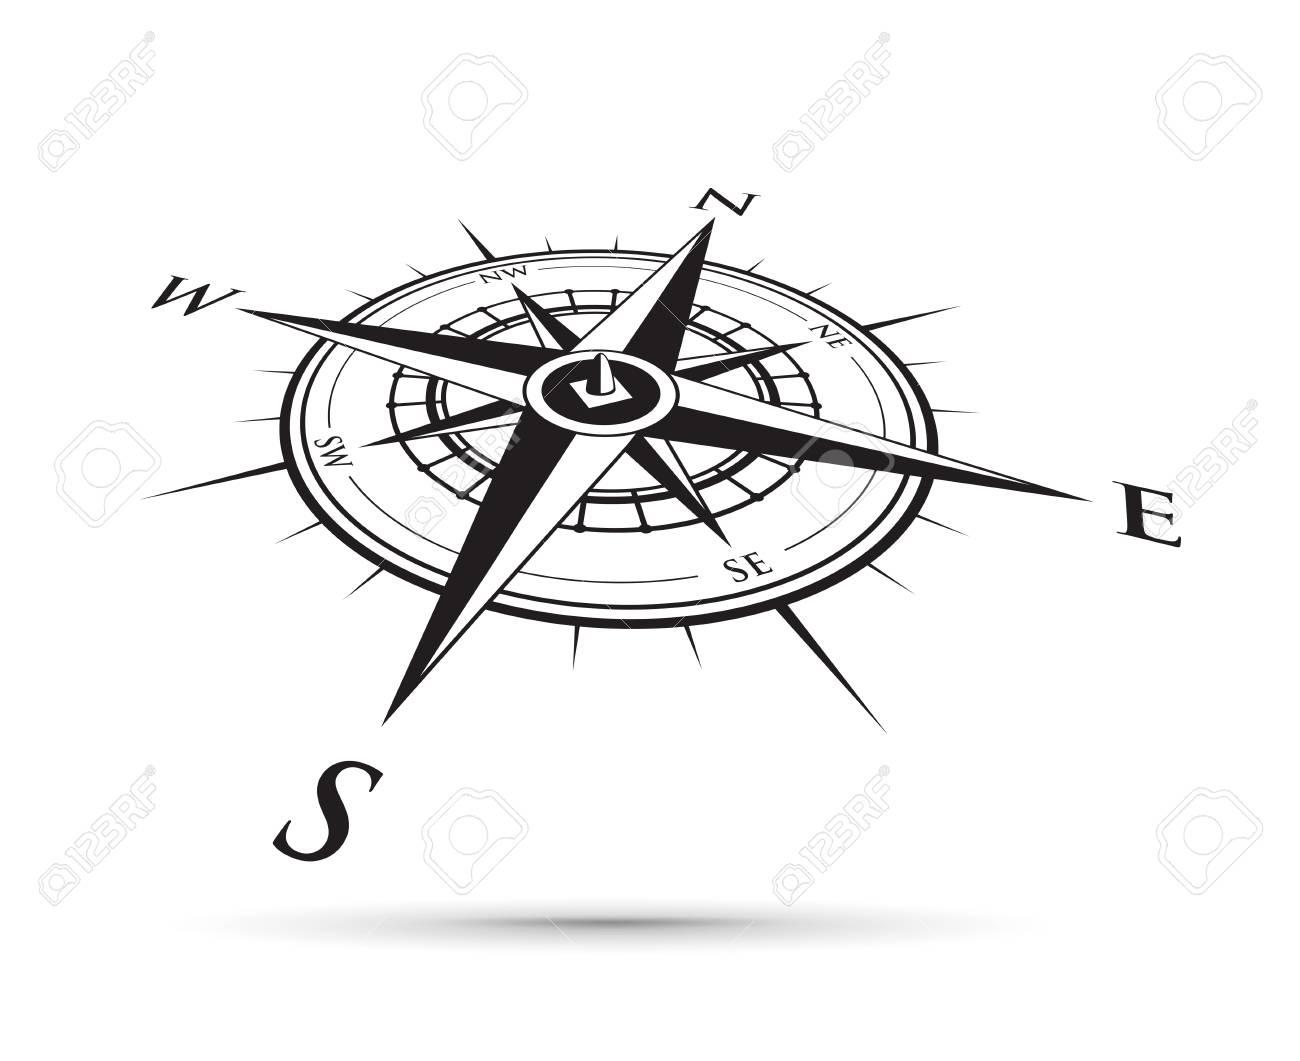 black compass illustration. - 94219933